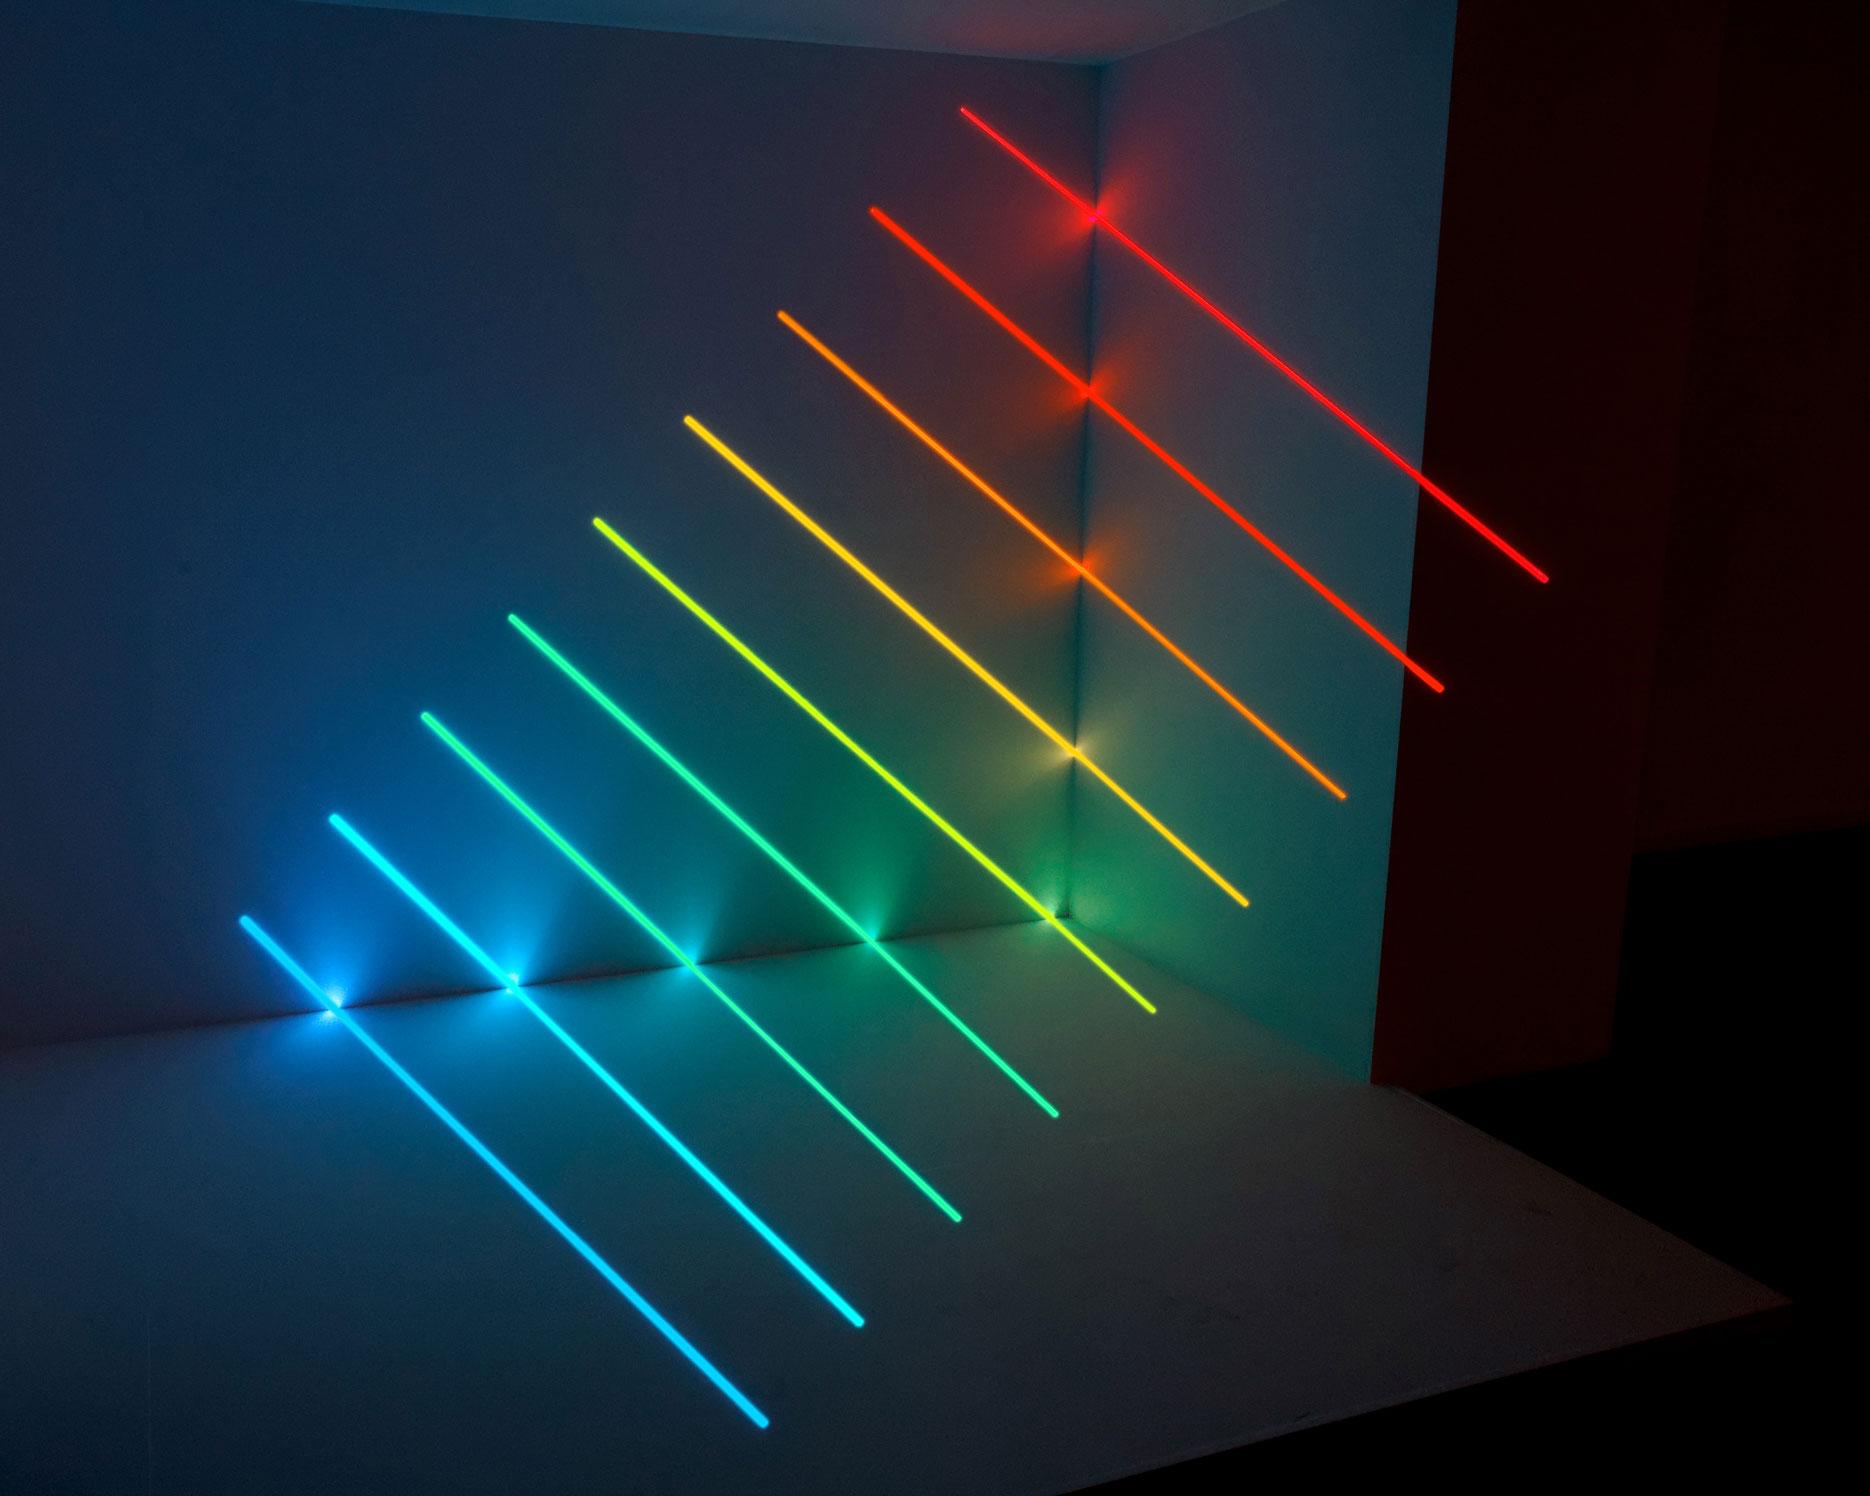 Olivier Ratsi, Spectrum Computer, LED, Holz 212 x 256 x 180 cm, Ortsspezifische Installation, Hersteller: Crossed Lab © Olivier Ratsi